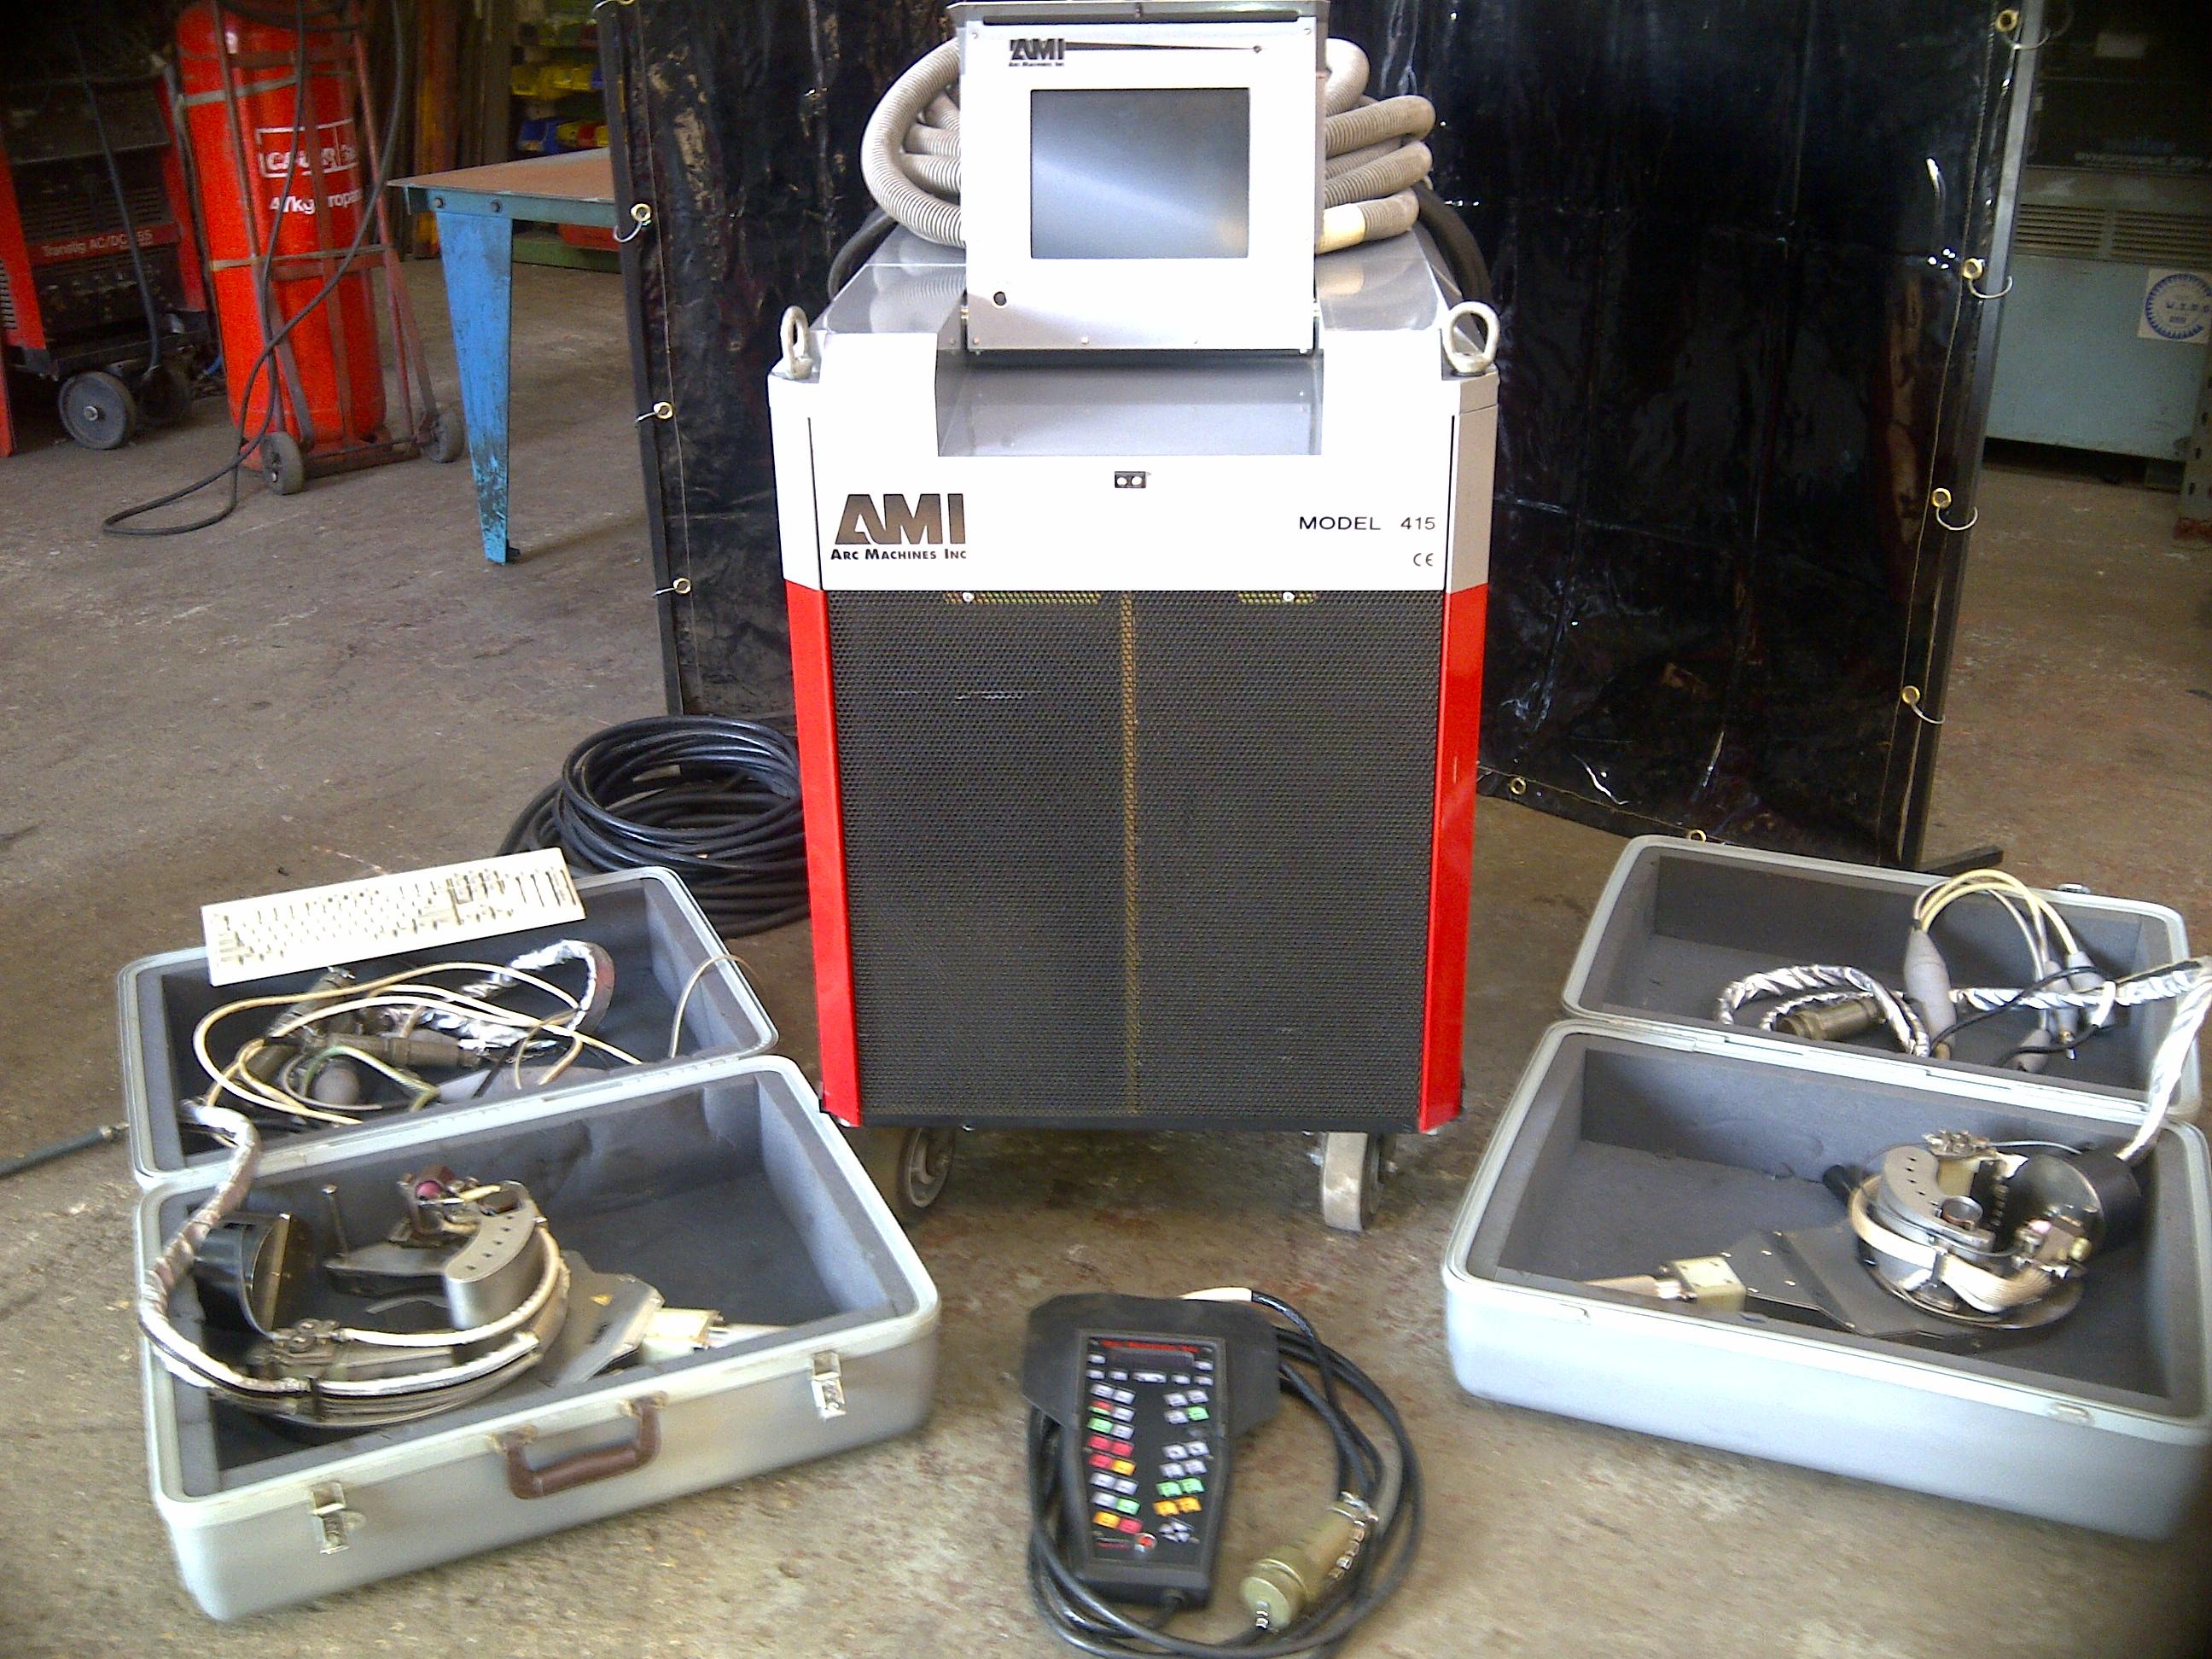 Arc Machines Inc tube to tube sheet welding